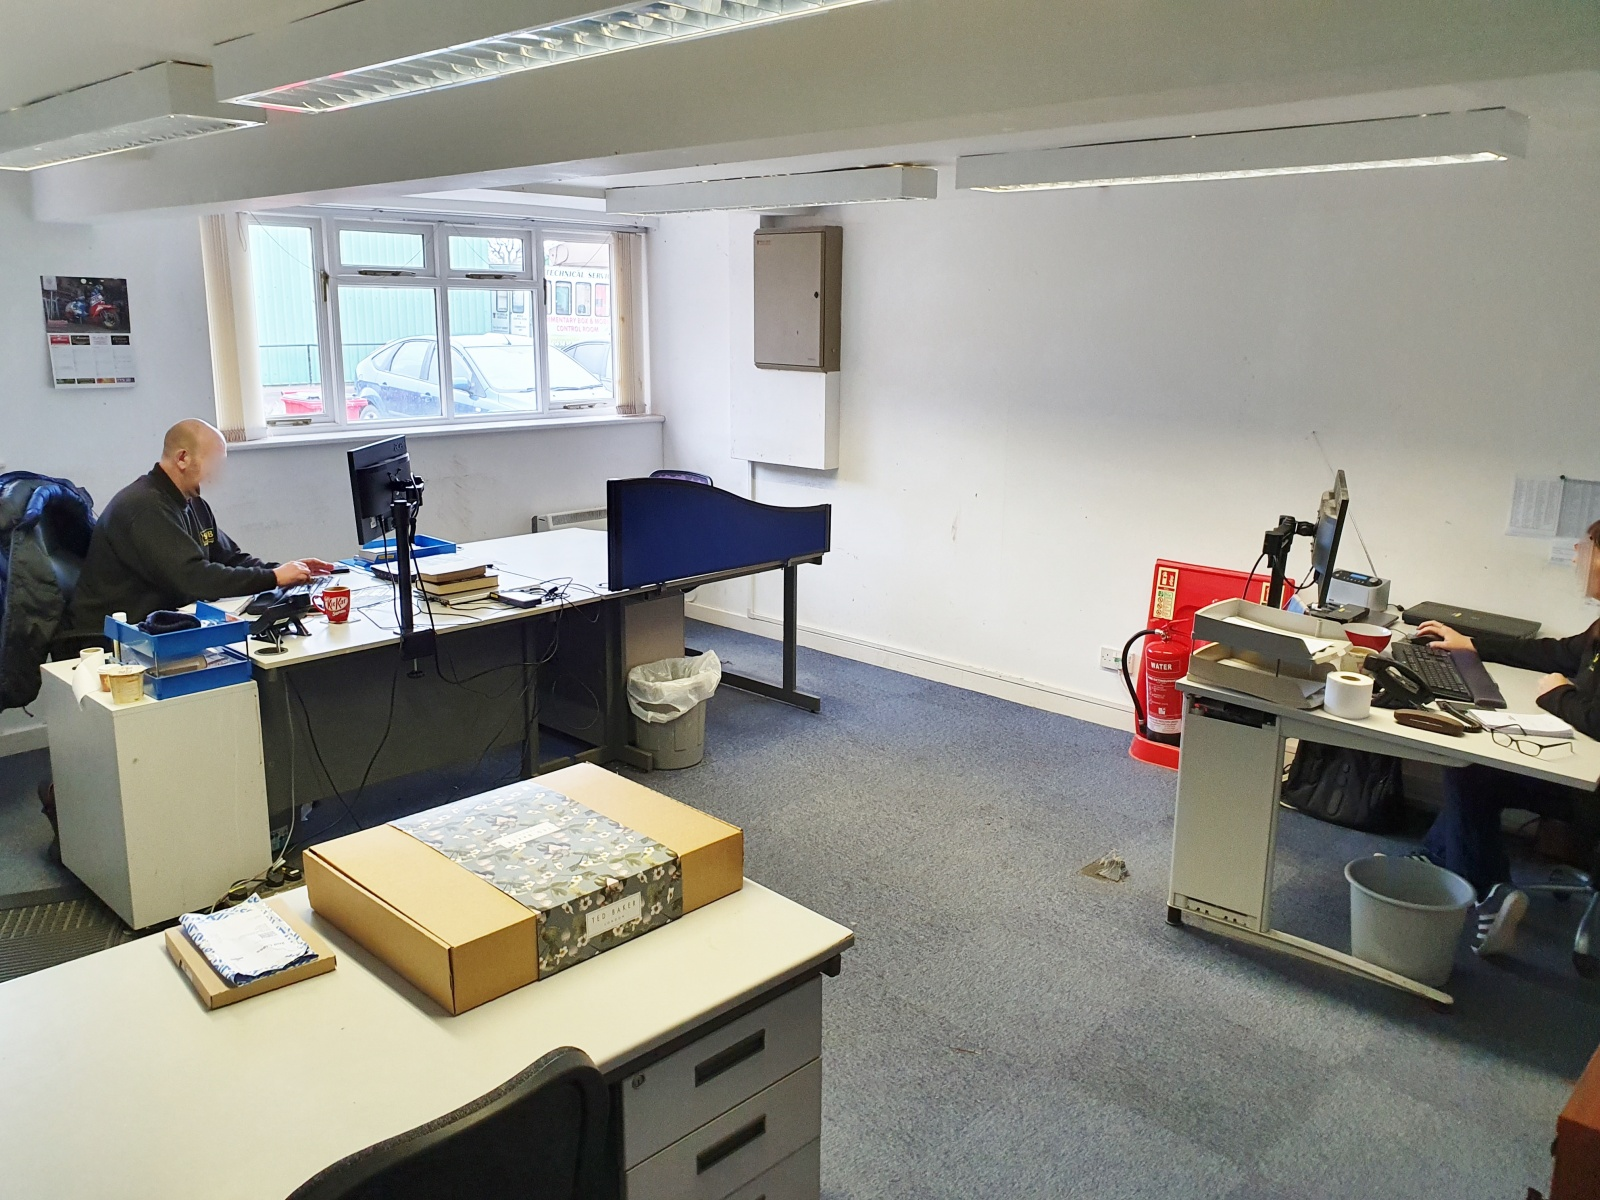 Unit 6 Bicton Business Park, Isle Lane, Bicton, Nr Shrewsbury, Shropshire